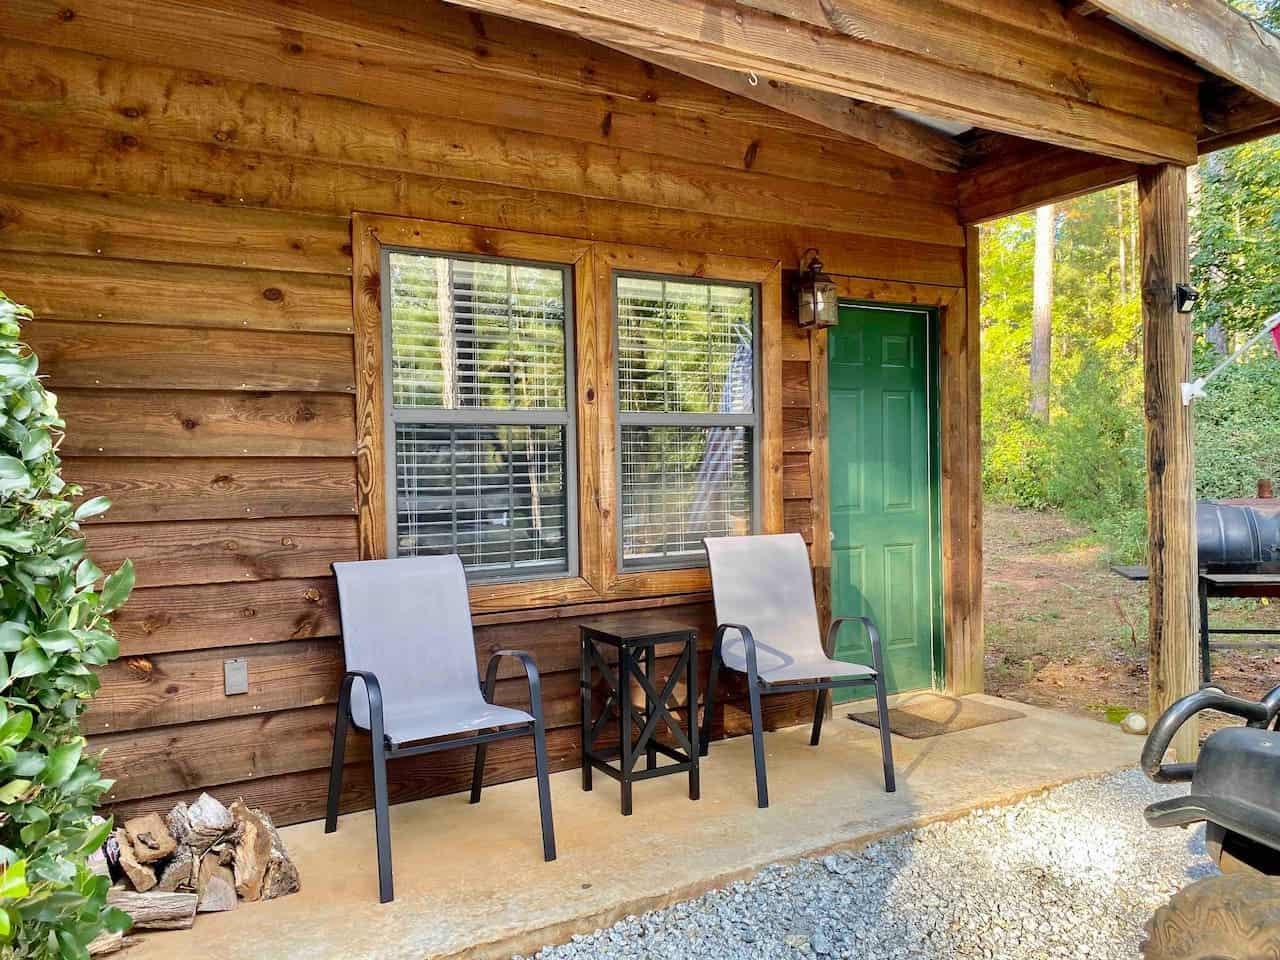 Image of Airbnb rental in Augusta, Georgia